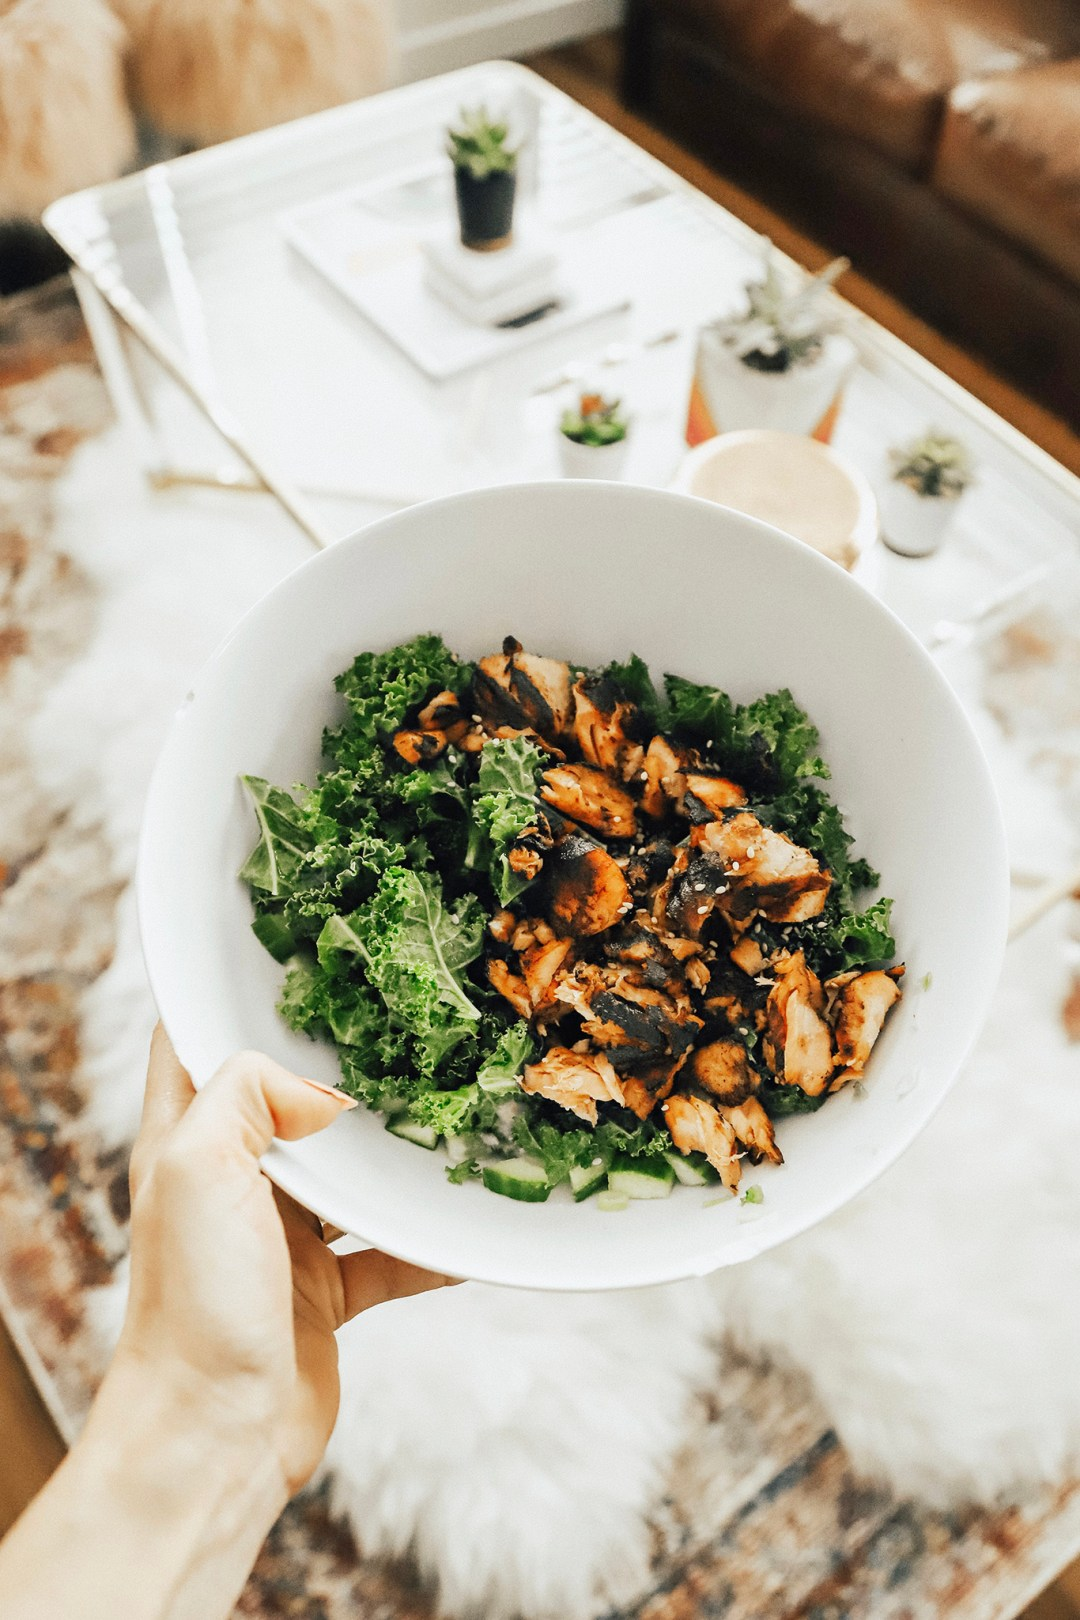 Alena Gidenko of modaprints.com shares her favorite healthy Paleo meals from home!